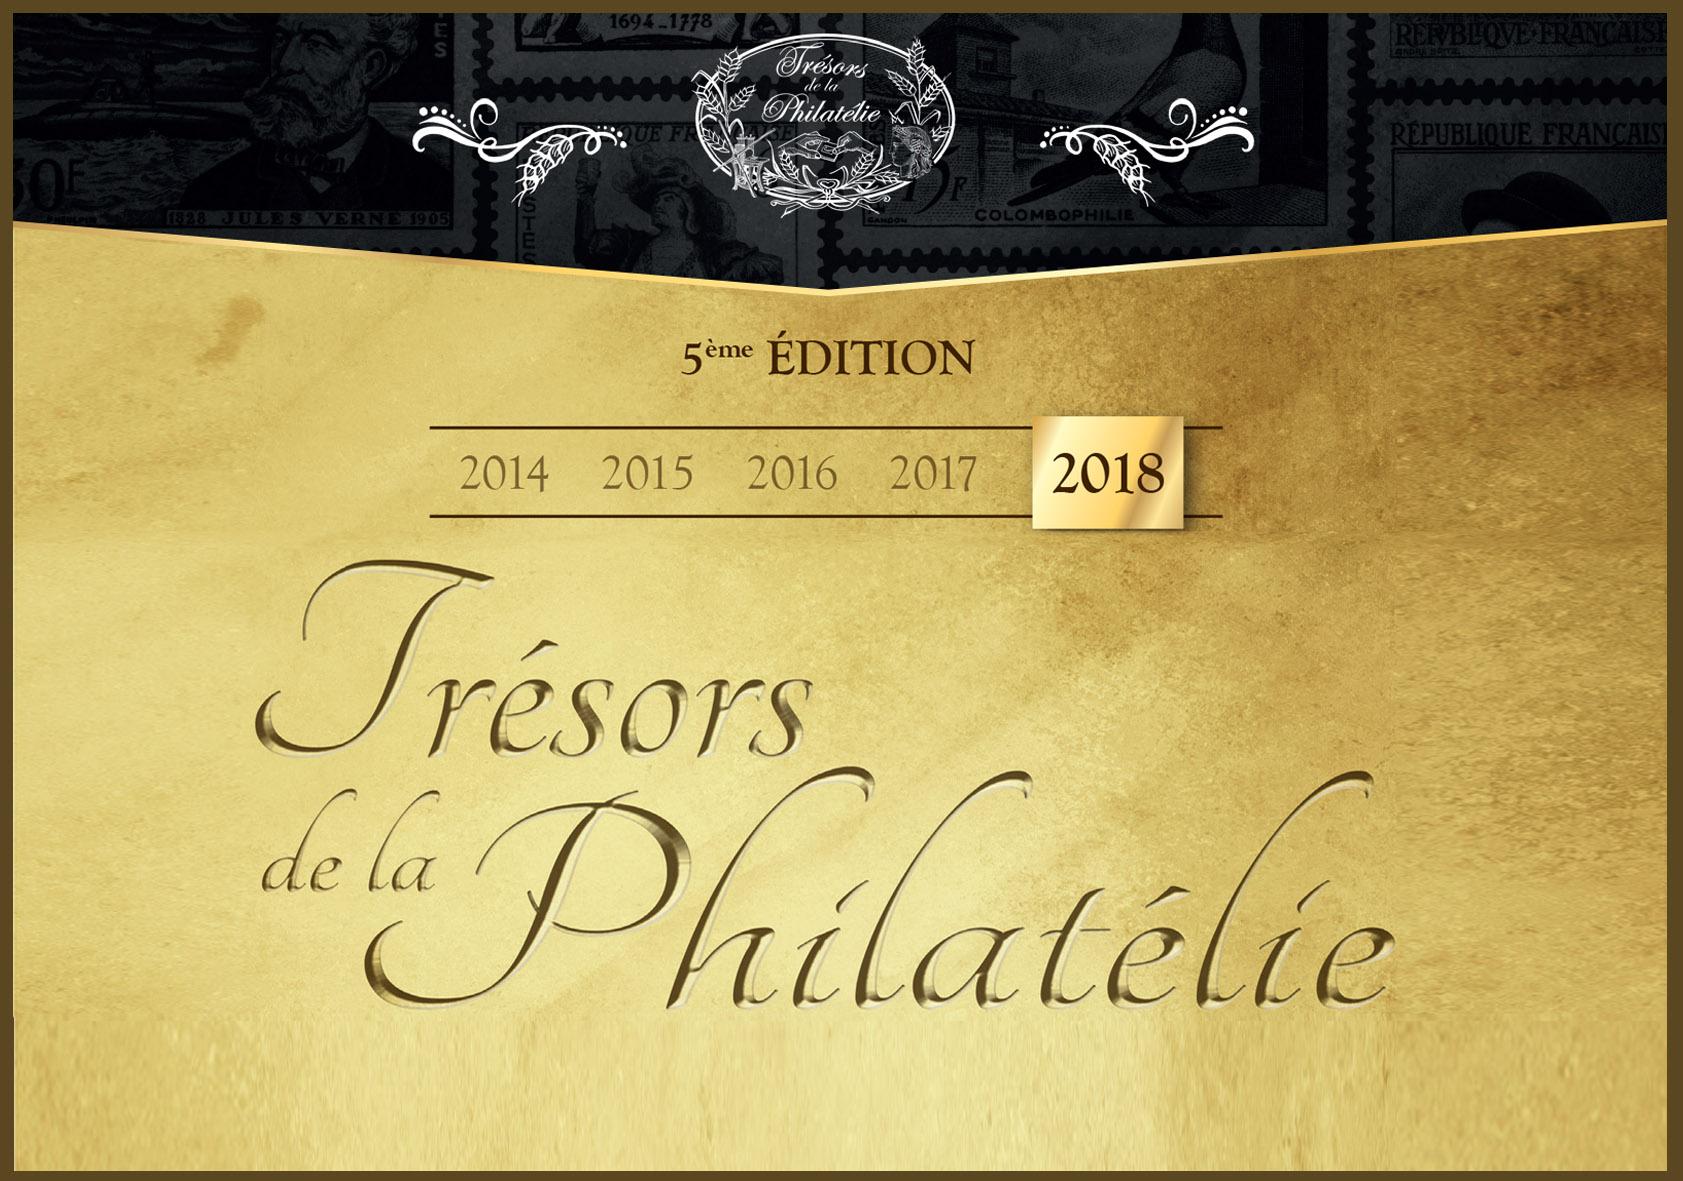 Trésor de la Philatélie 2018